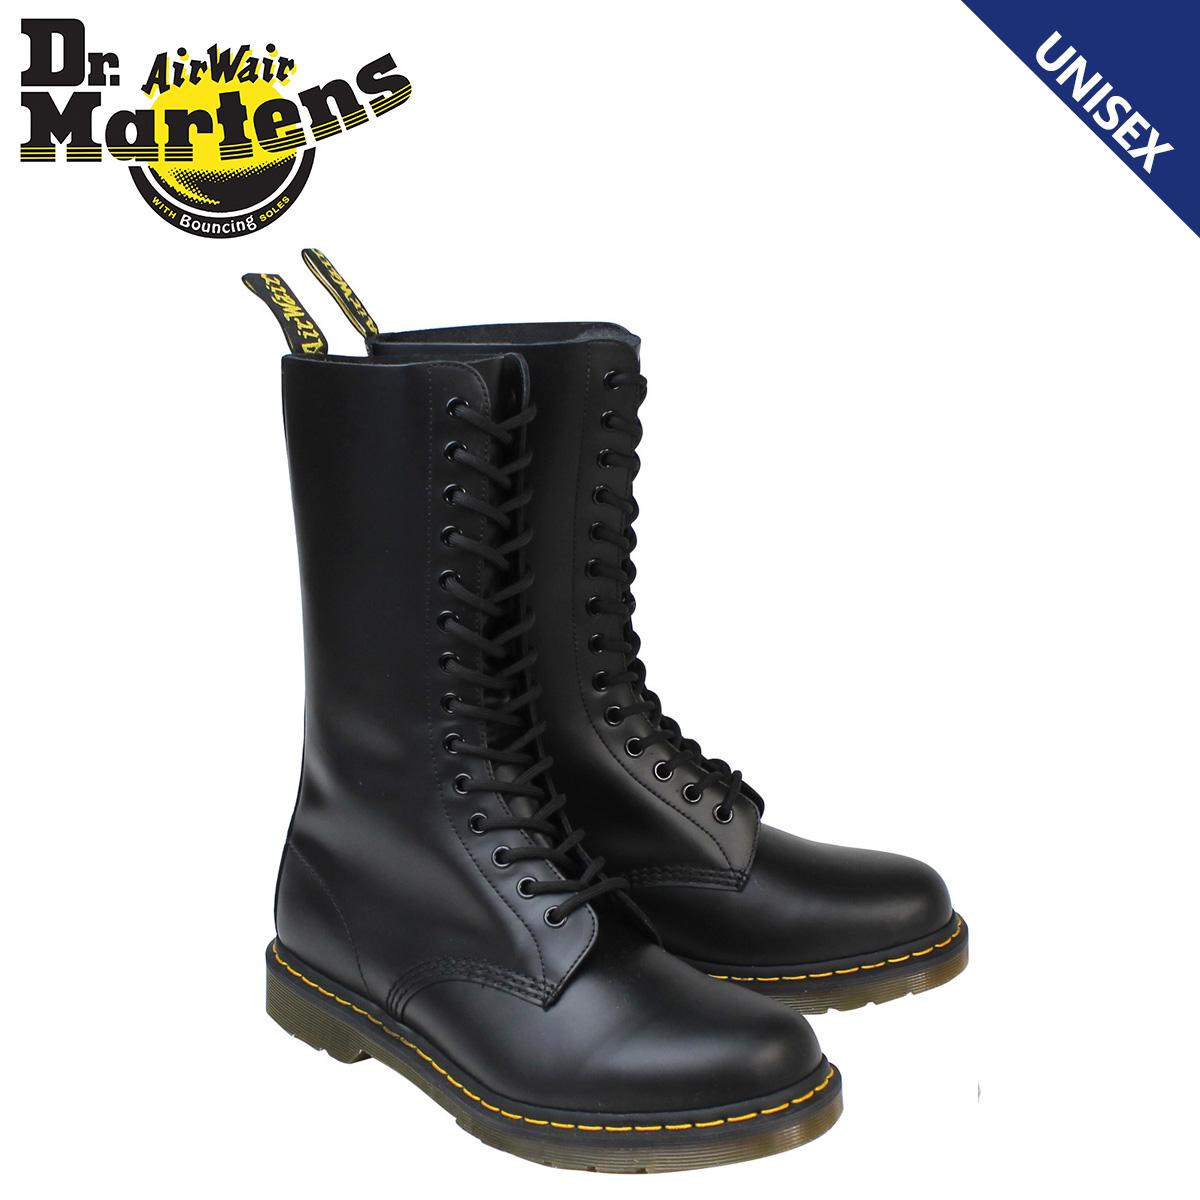 Dr.Martens ドクターマーチン 1914 14ホール ブーツ 14EYE BOOT R11855001 メンズ